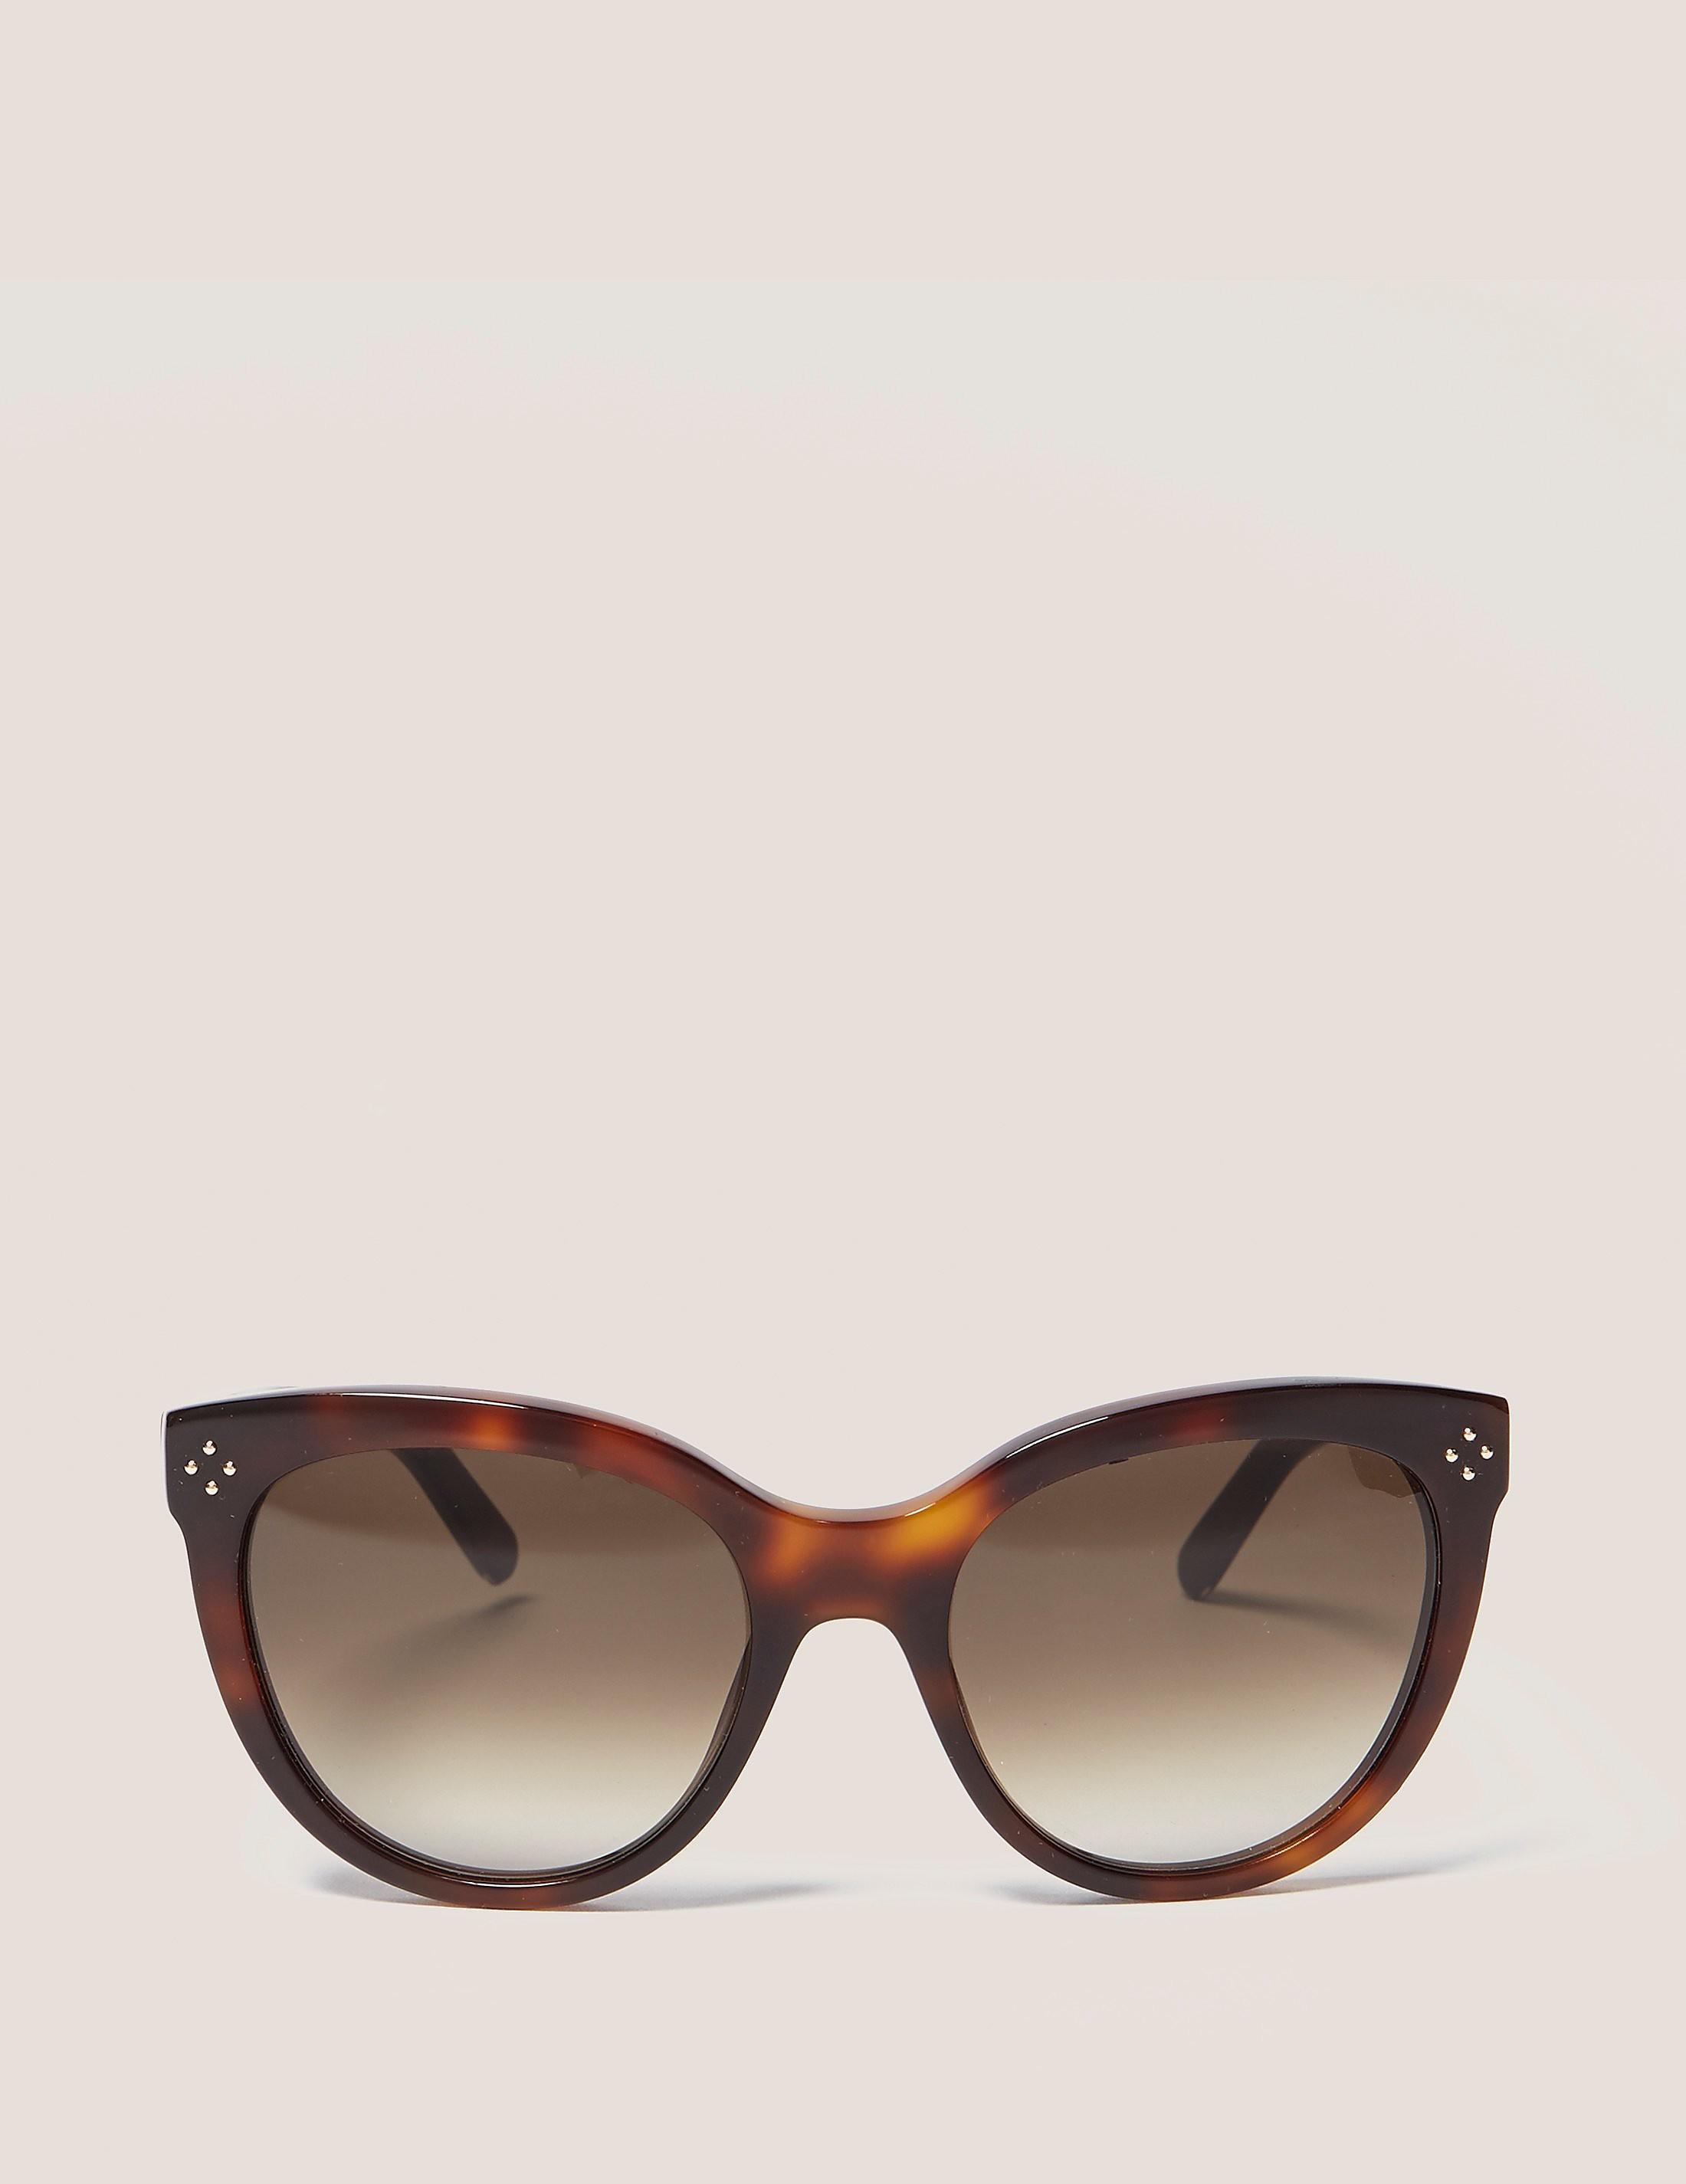 Chloe Havana Sunglasses